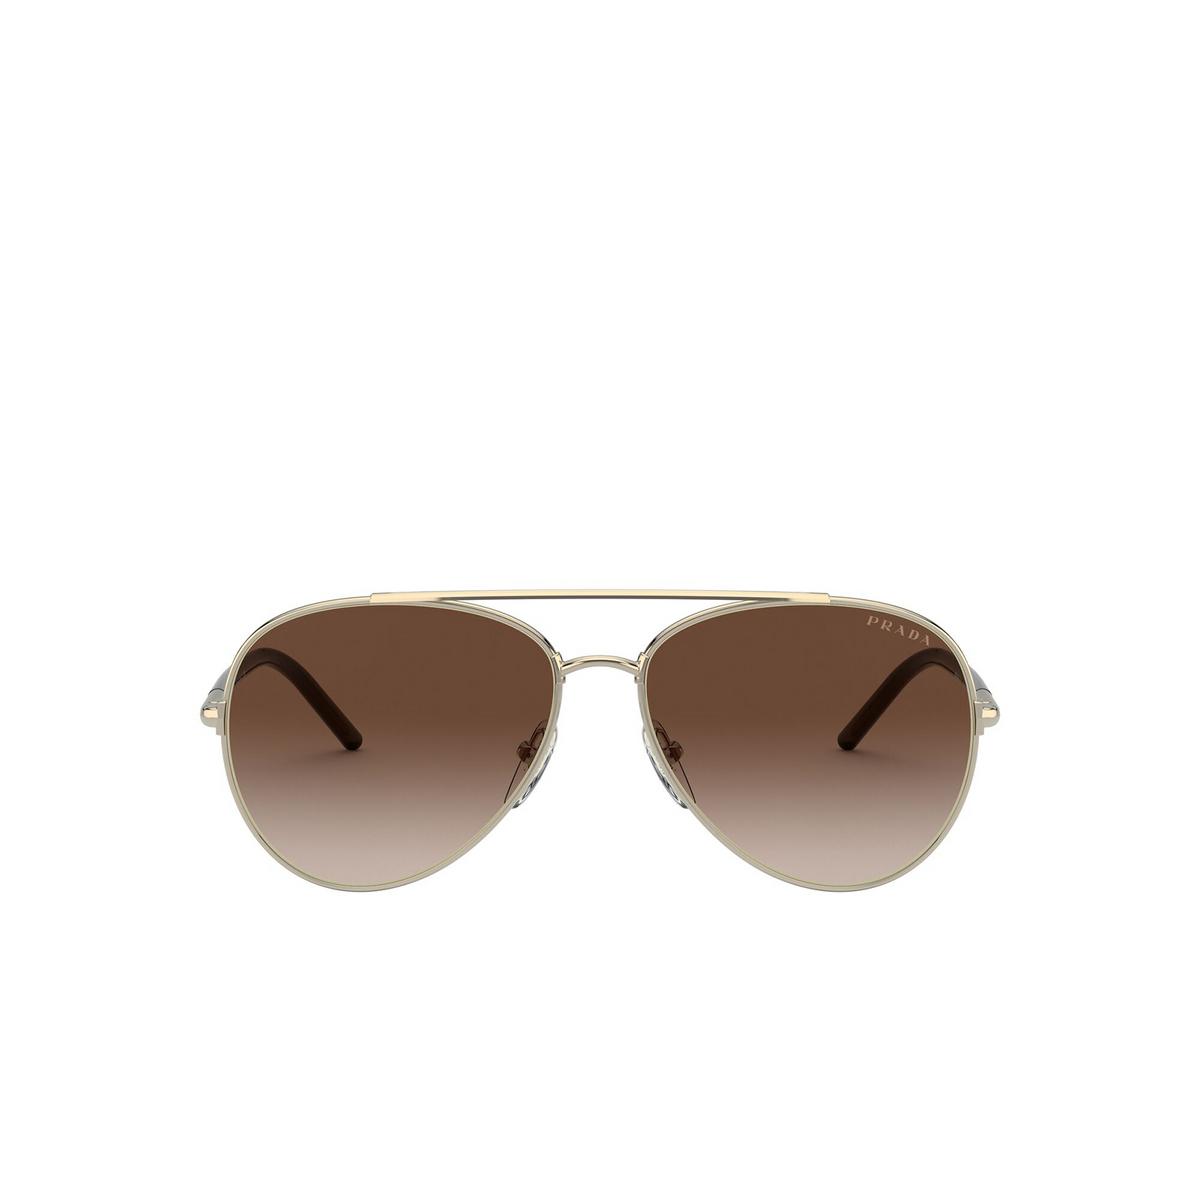 Prada® Aviator Sunglasses: PR 66XS color Pale Gold ZVN6S1 - front view.